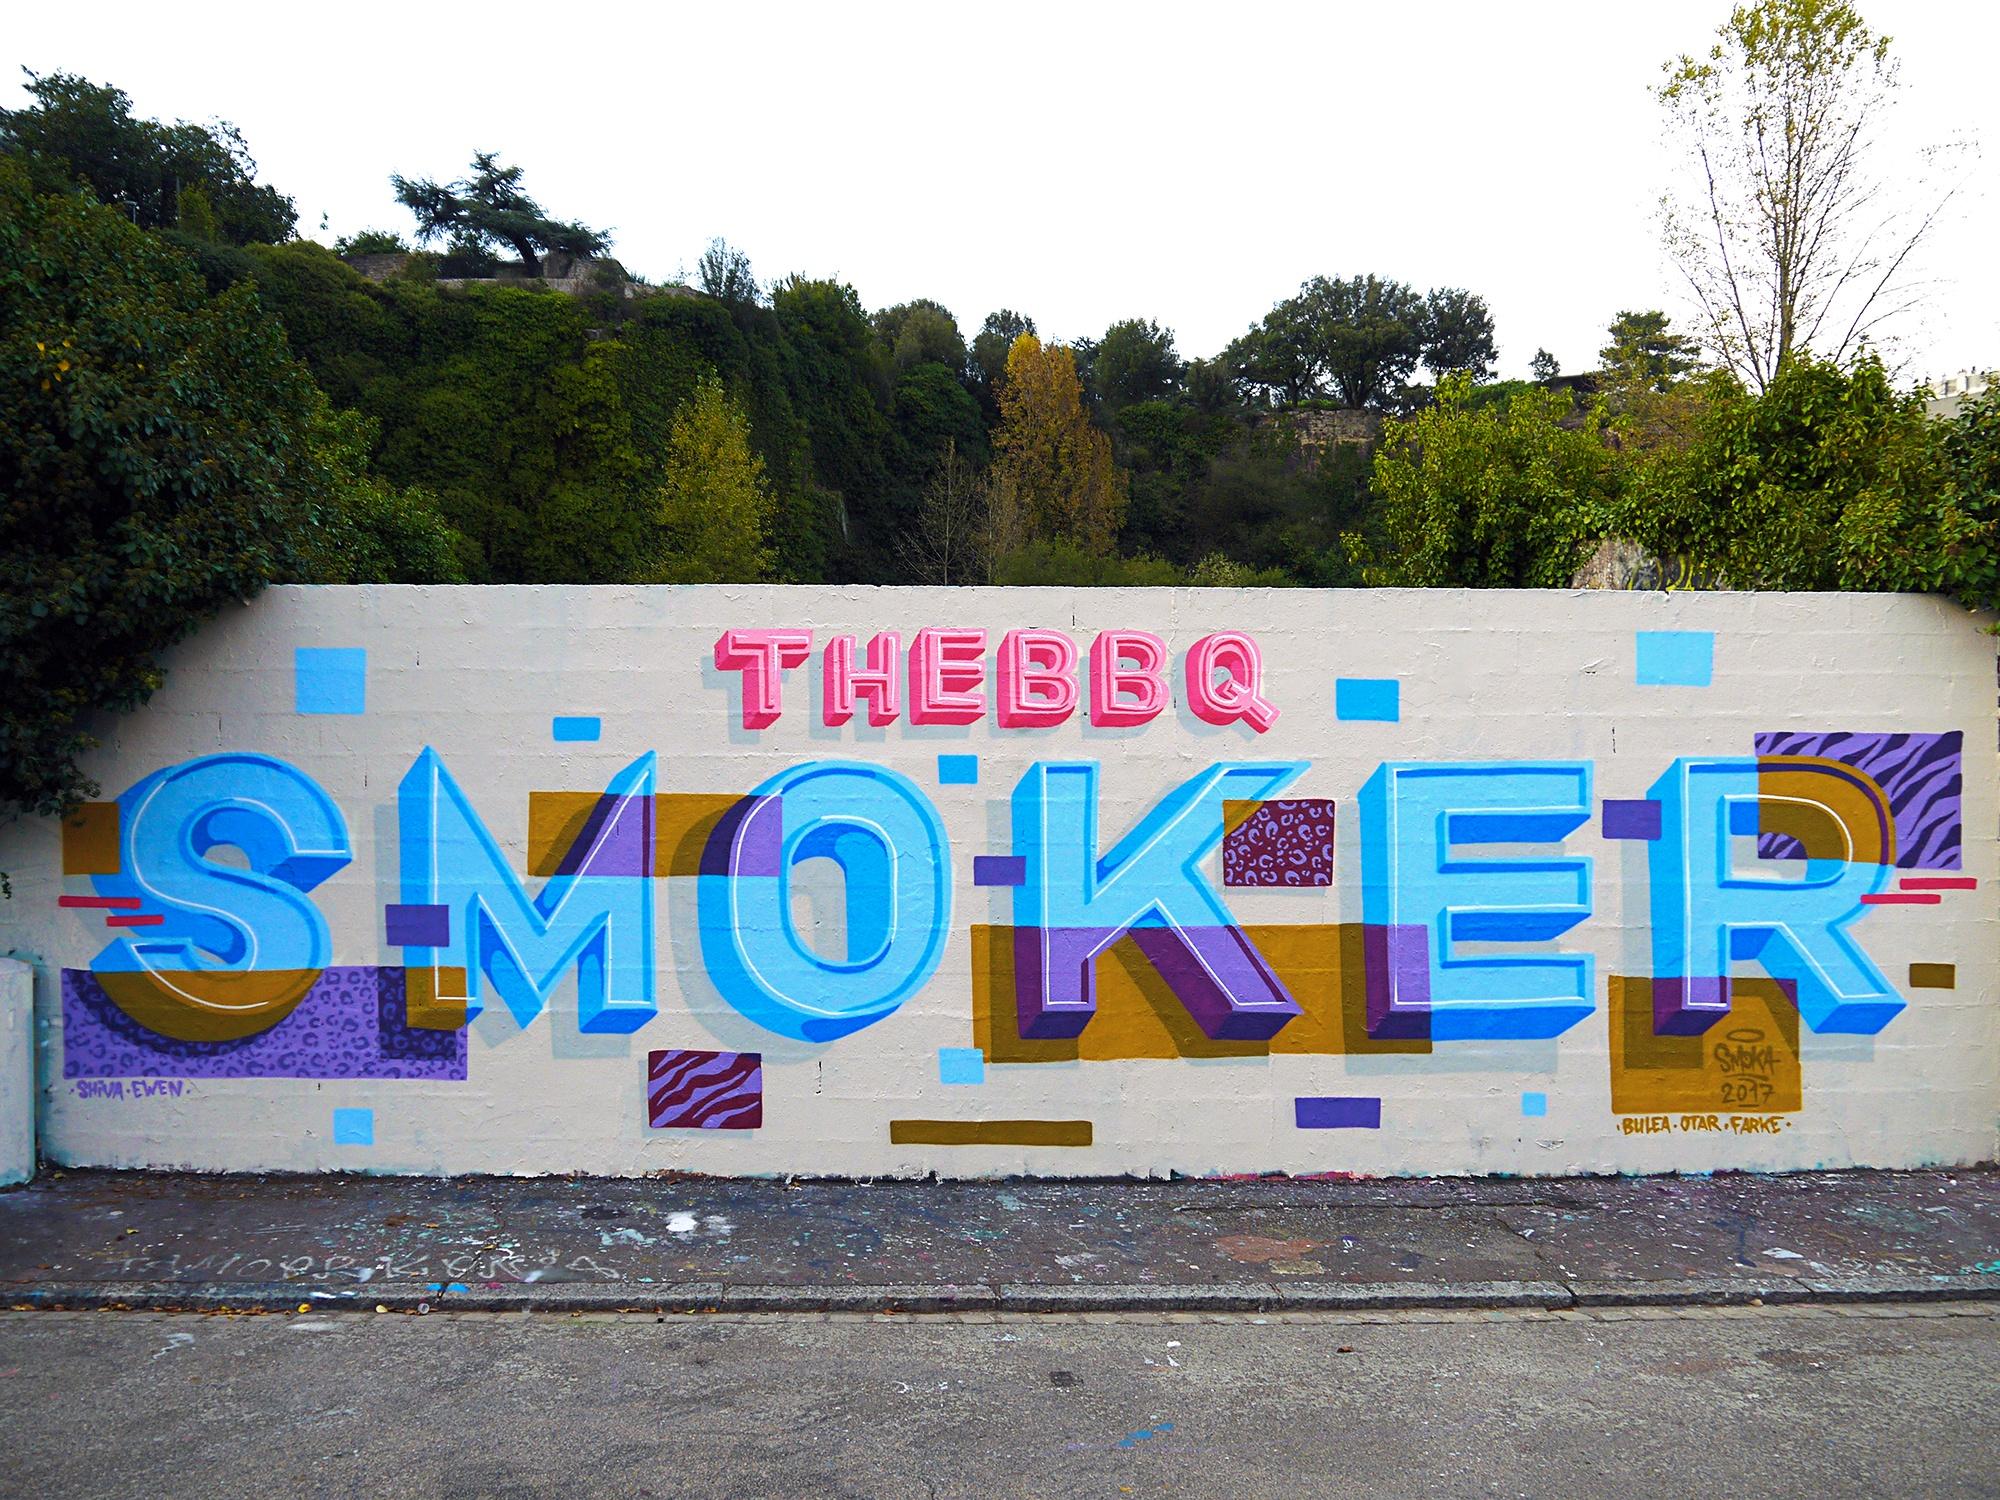 THE BBQ SMOKER